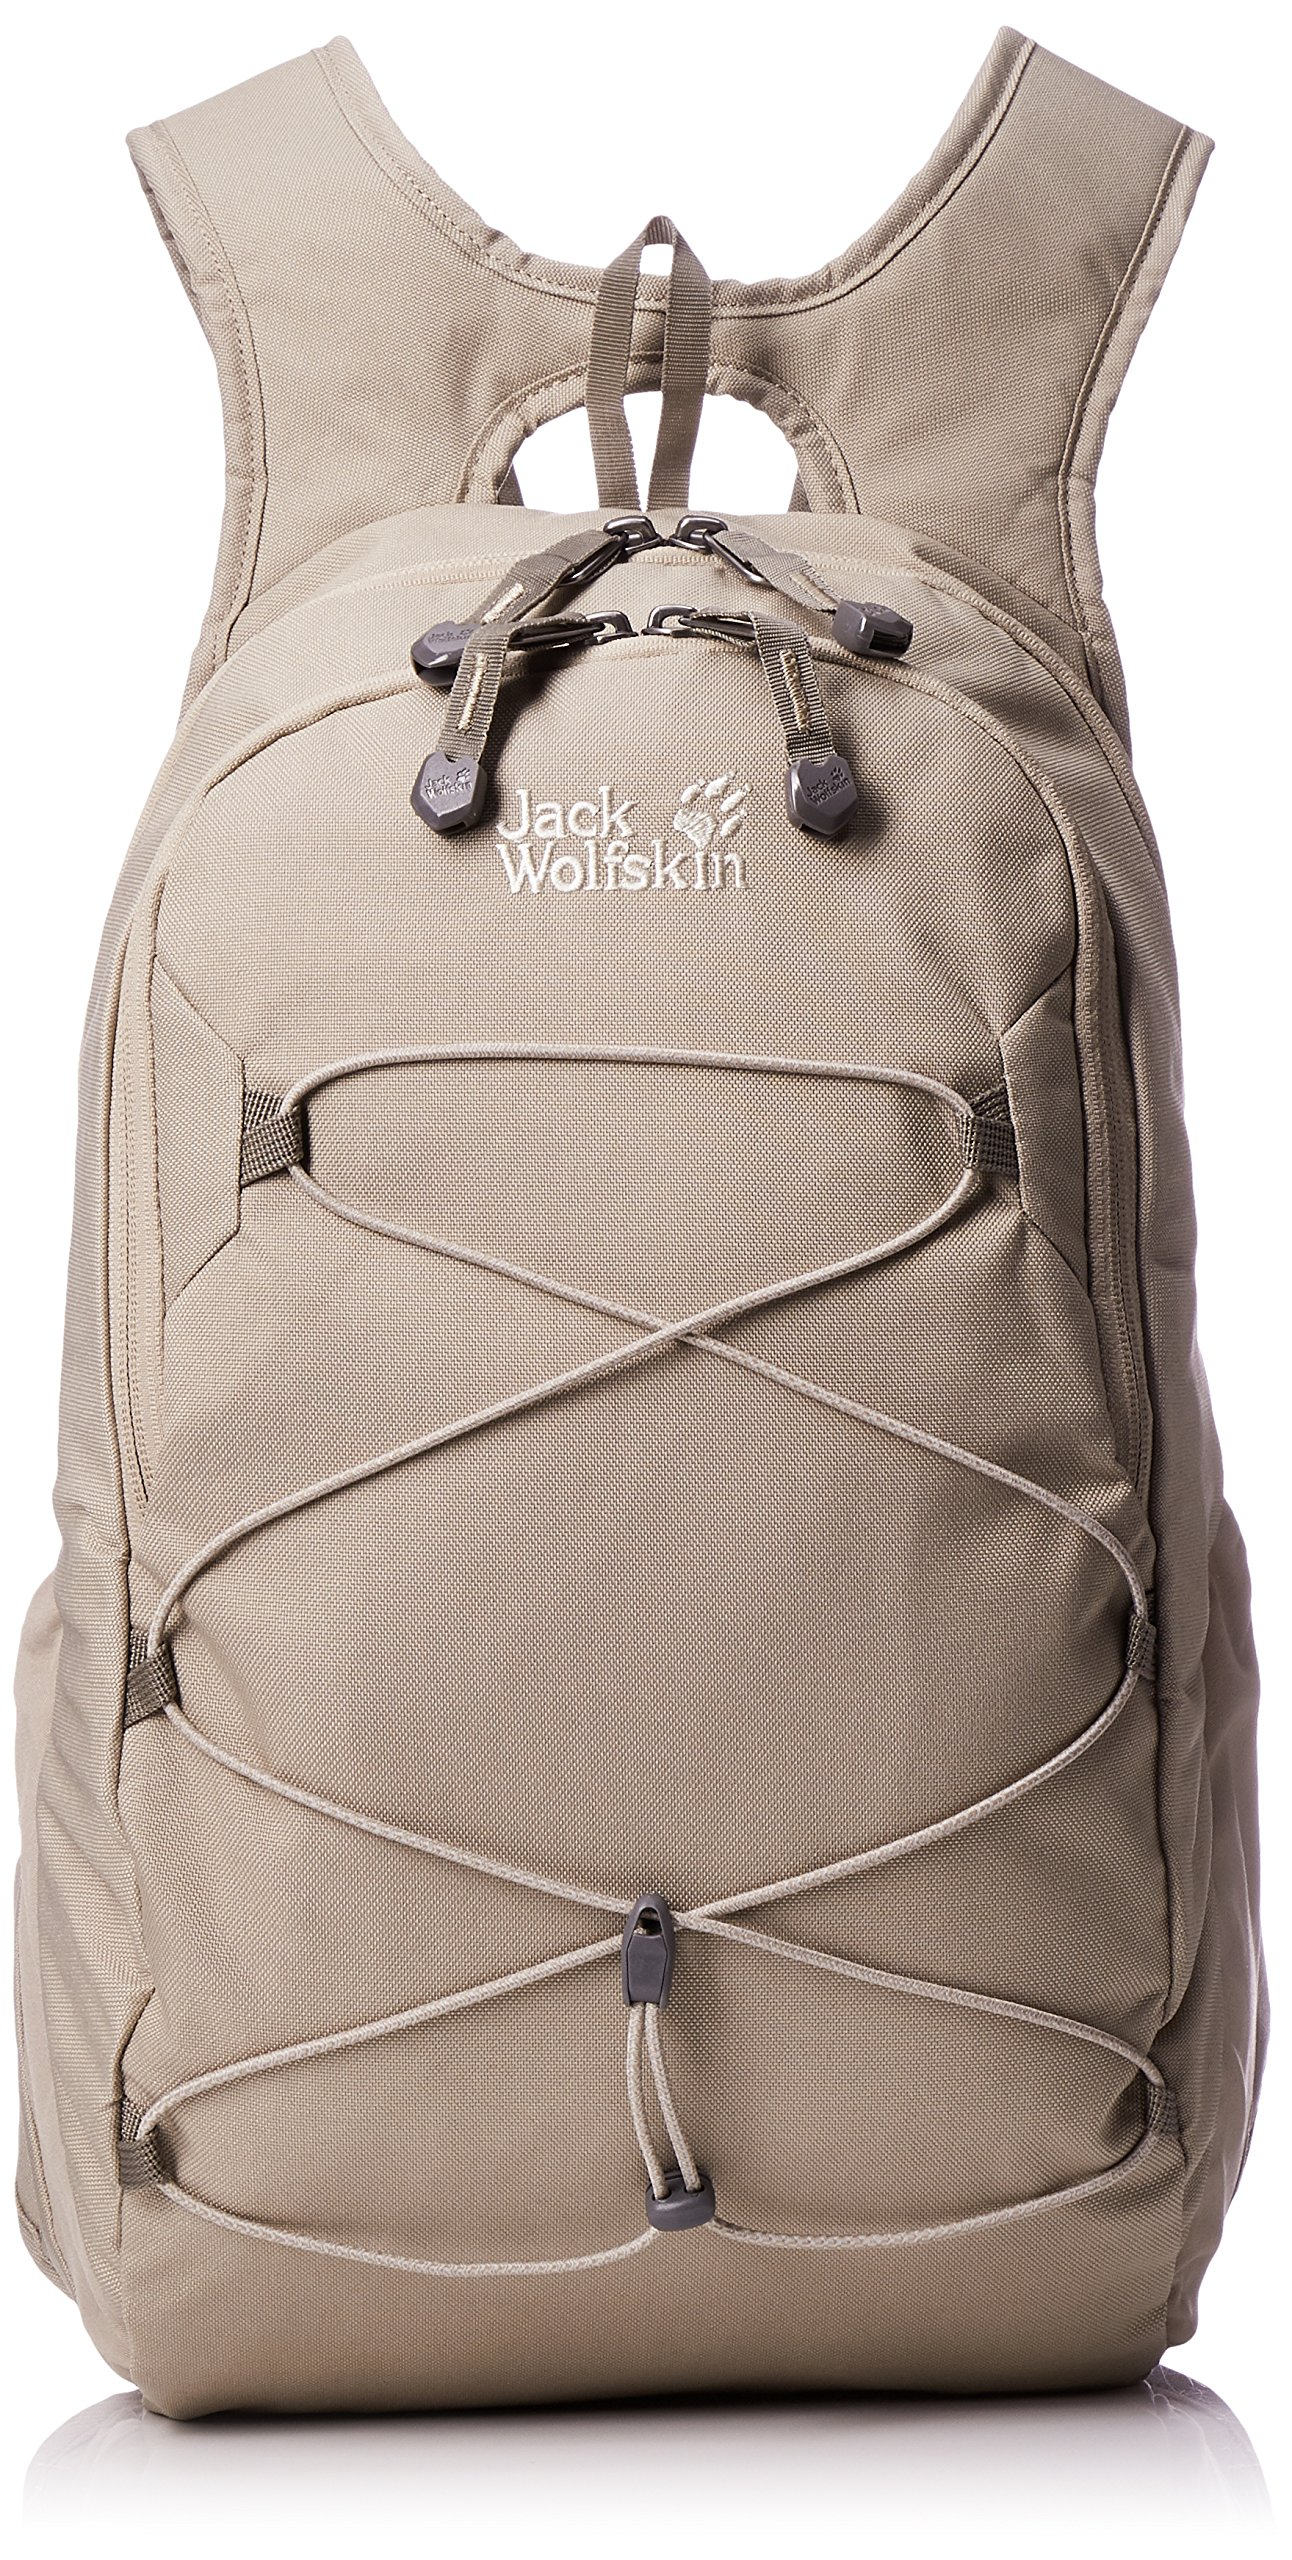 Jack Wolfskin Savona Hiking Daypacks, Beige, One Size